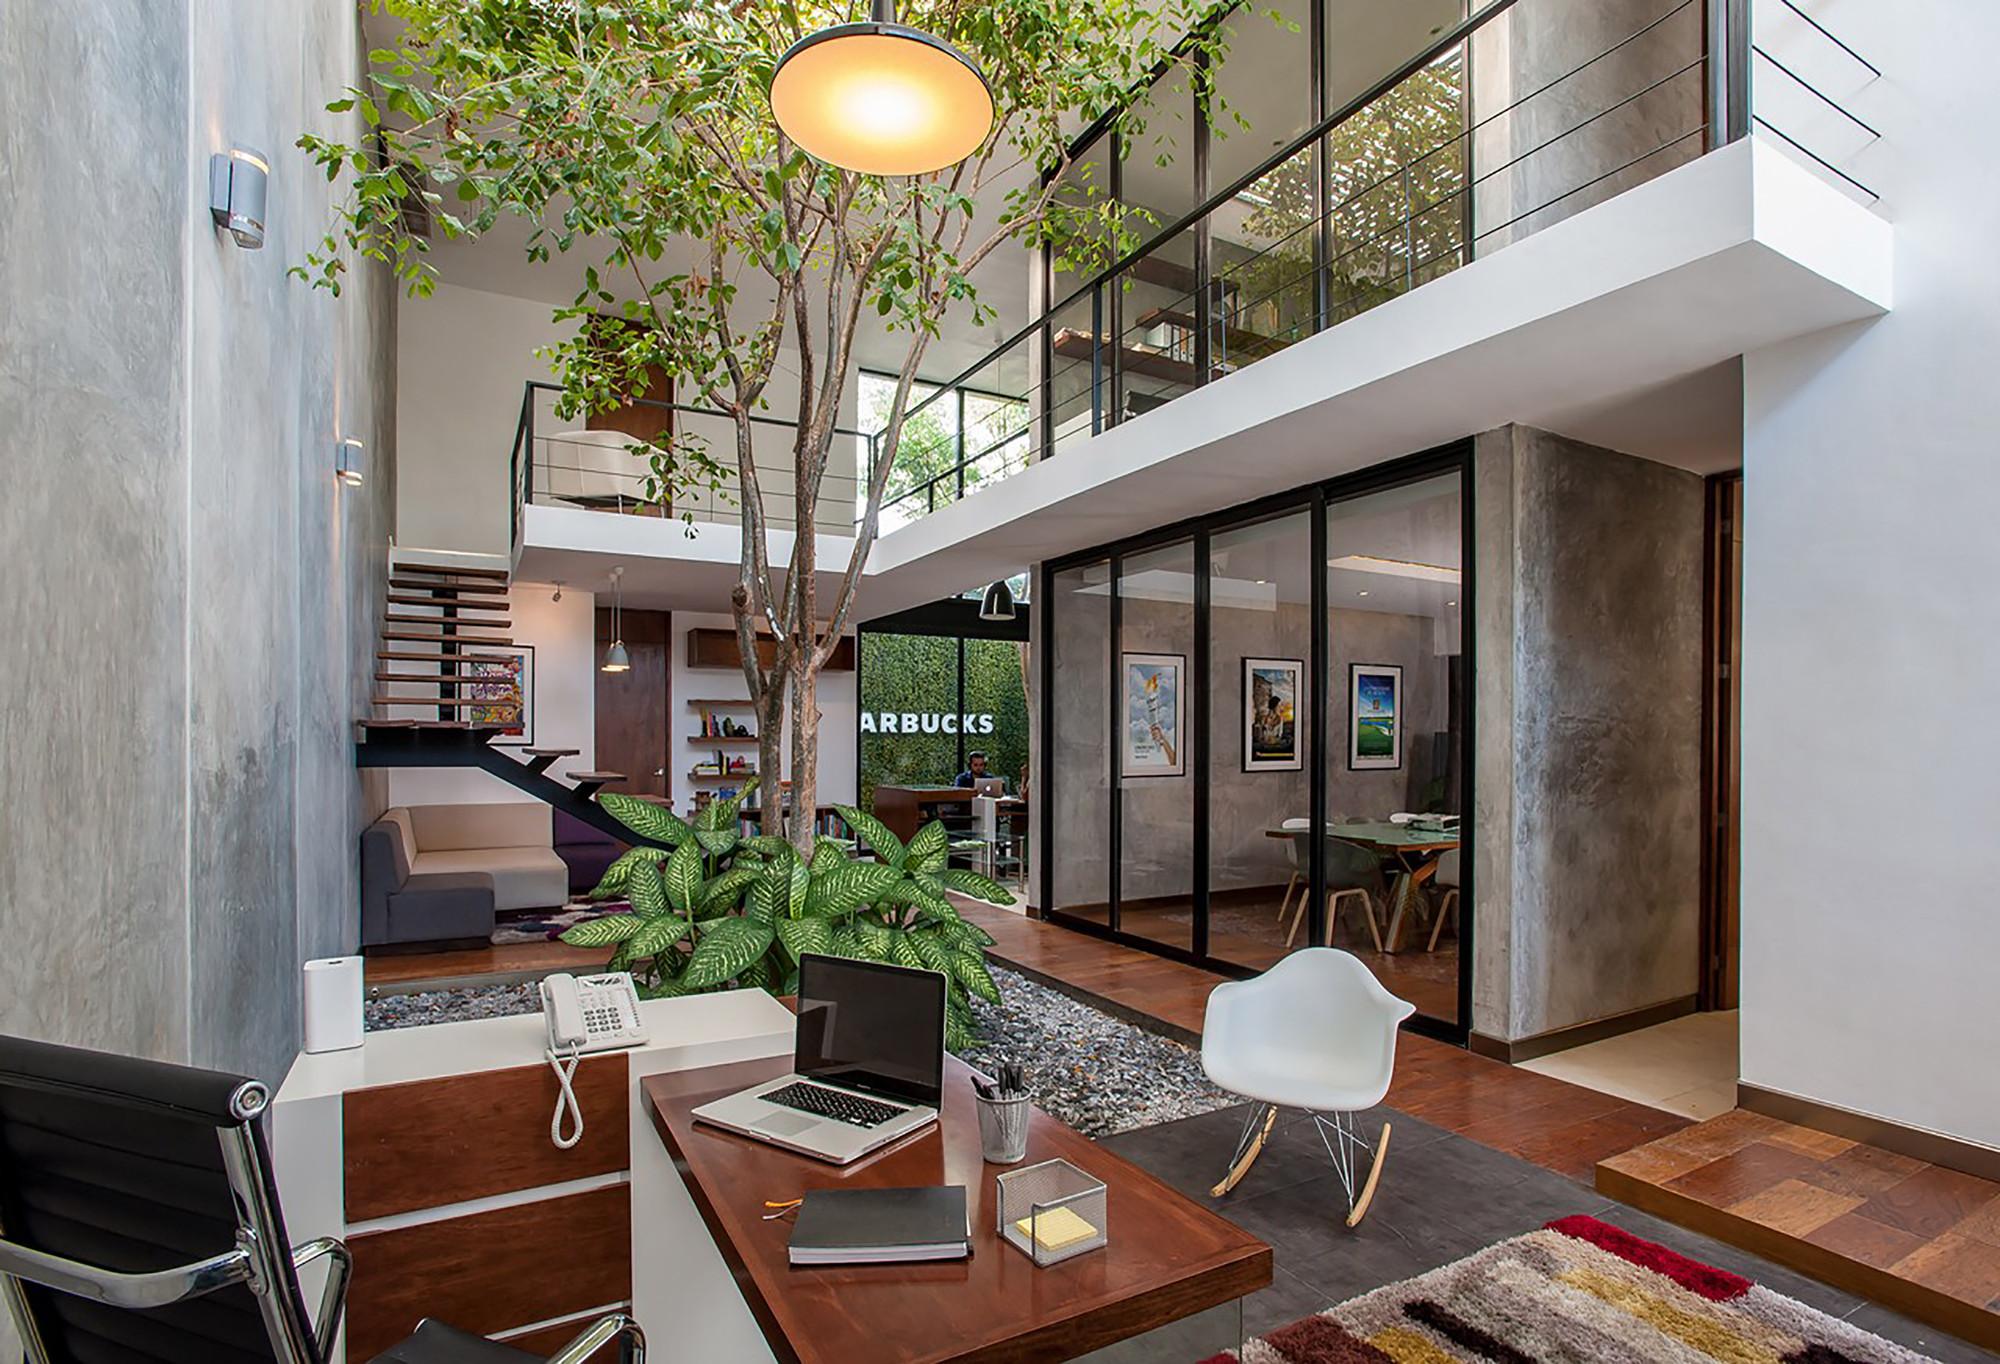 Oficinas matatena desnivel arquitectos archdaily m xico for Plantas para decoracion minimalista